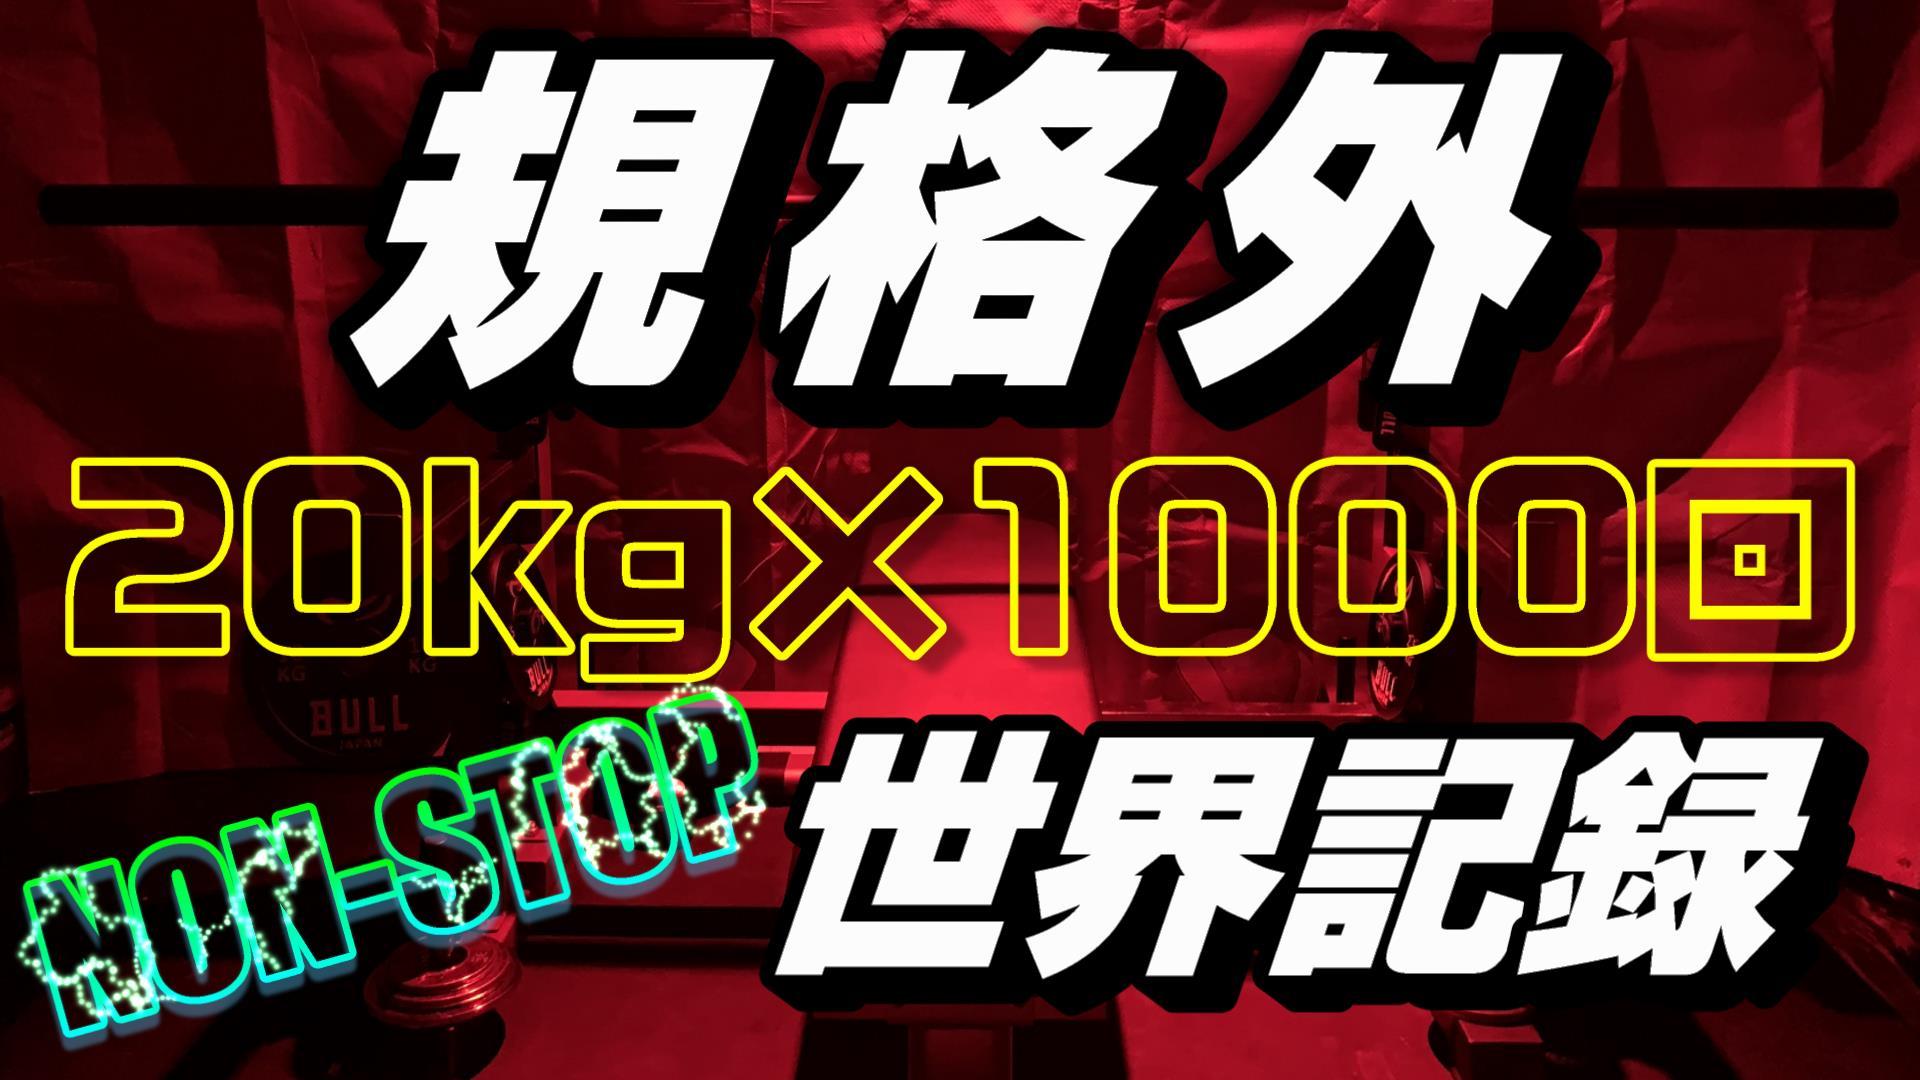 Empty Barbell Bench Press Max Reps NON-STOP CHALLENGE【WORLD RECORD】ベンチプレス(バーだけ)ノンストップ・チャレンジ【20kg×1000回∞世界記録】